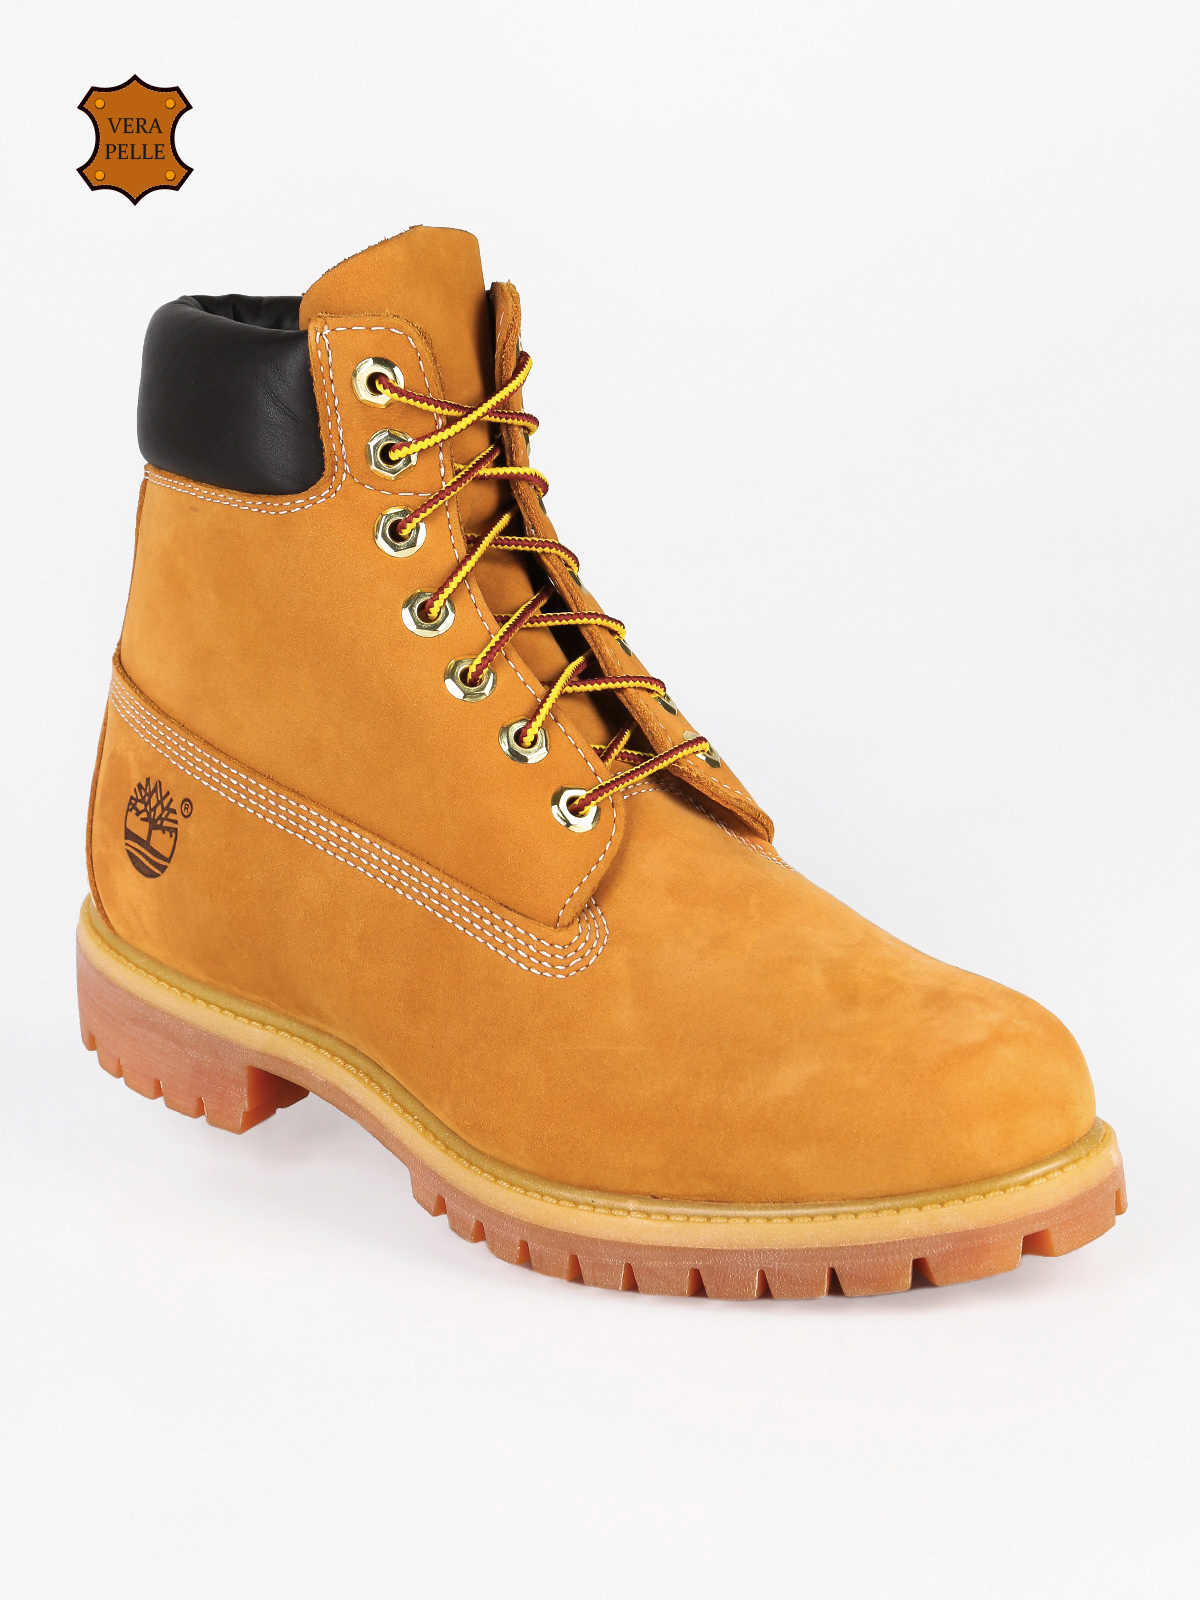 TIMBERLAND Boots men's premium 6 inch